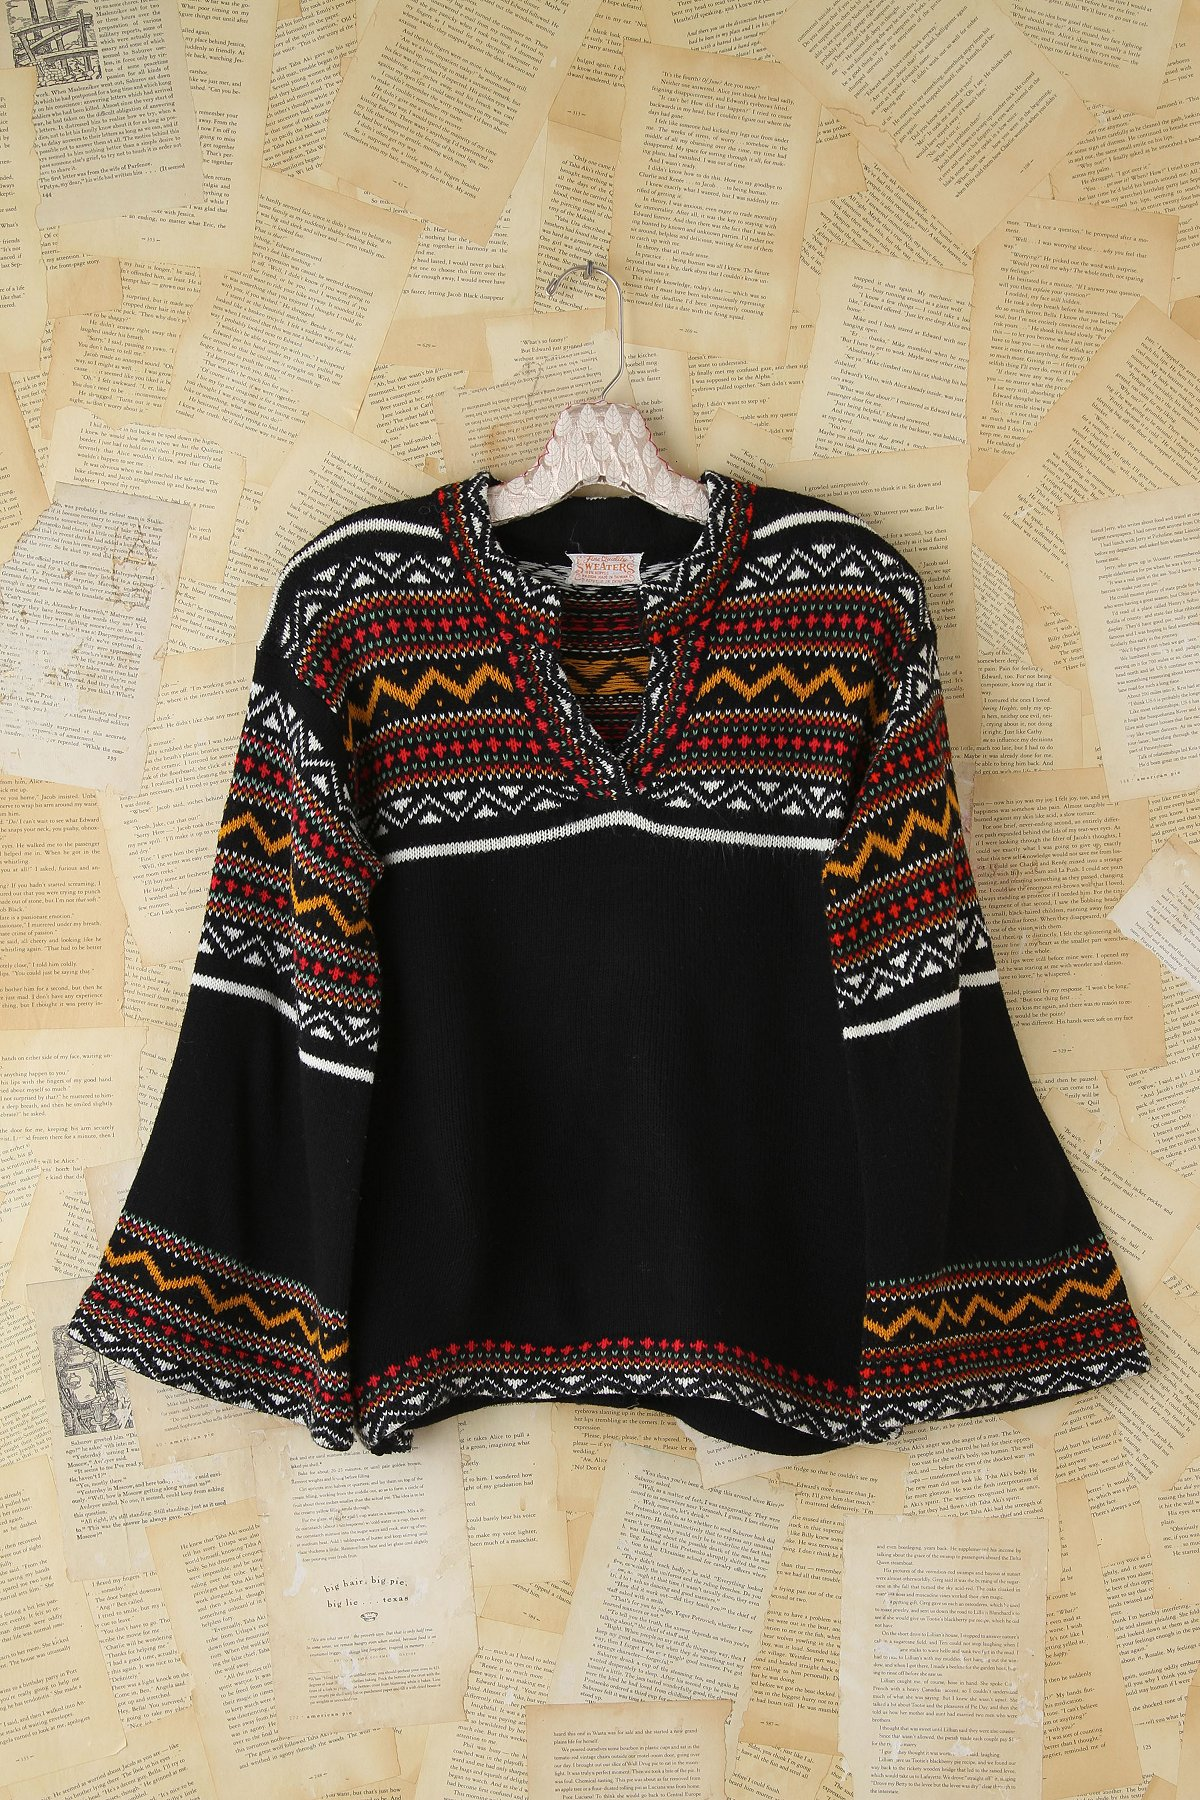 Vintage Patterned Knit Sweater